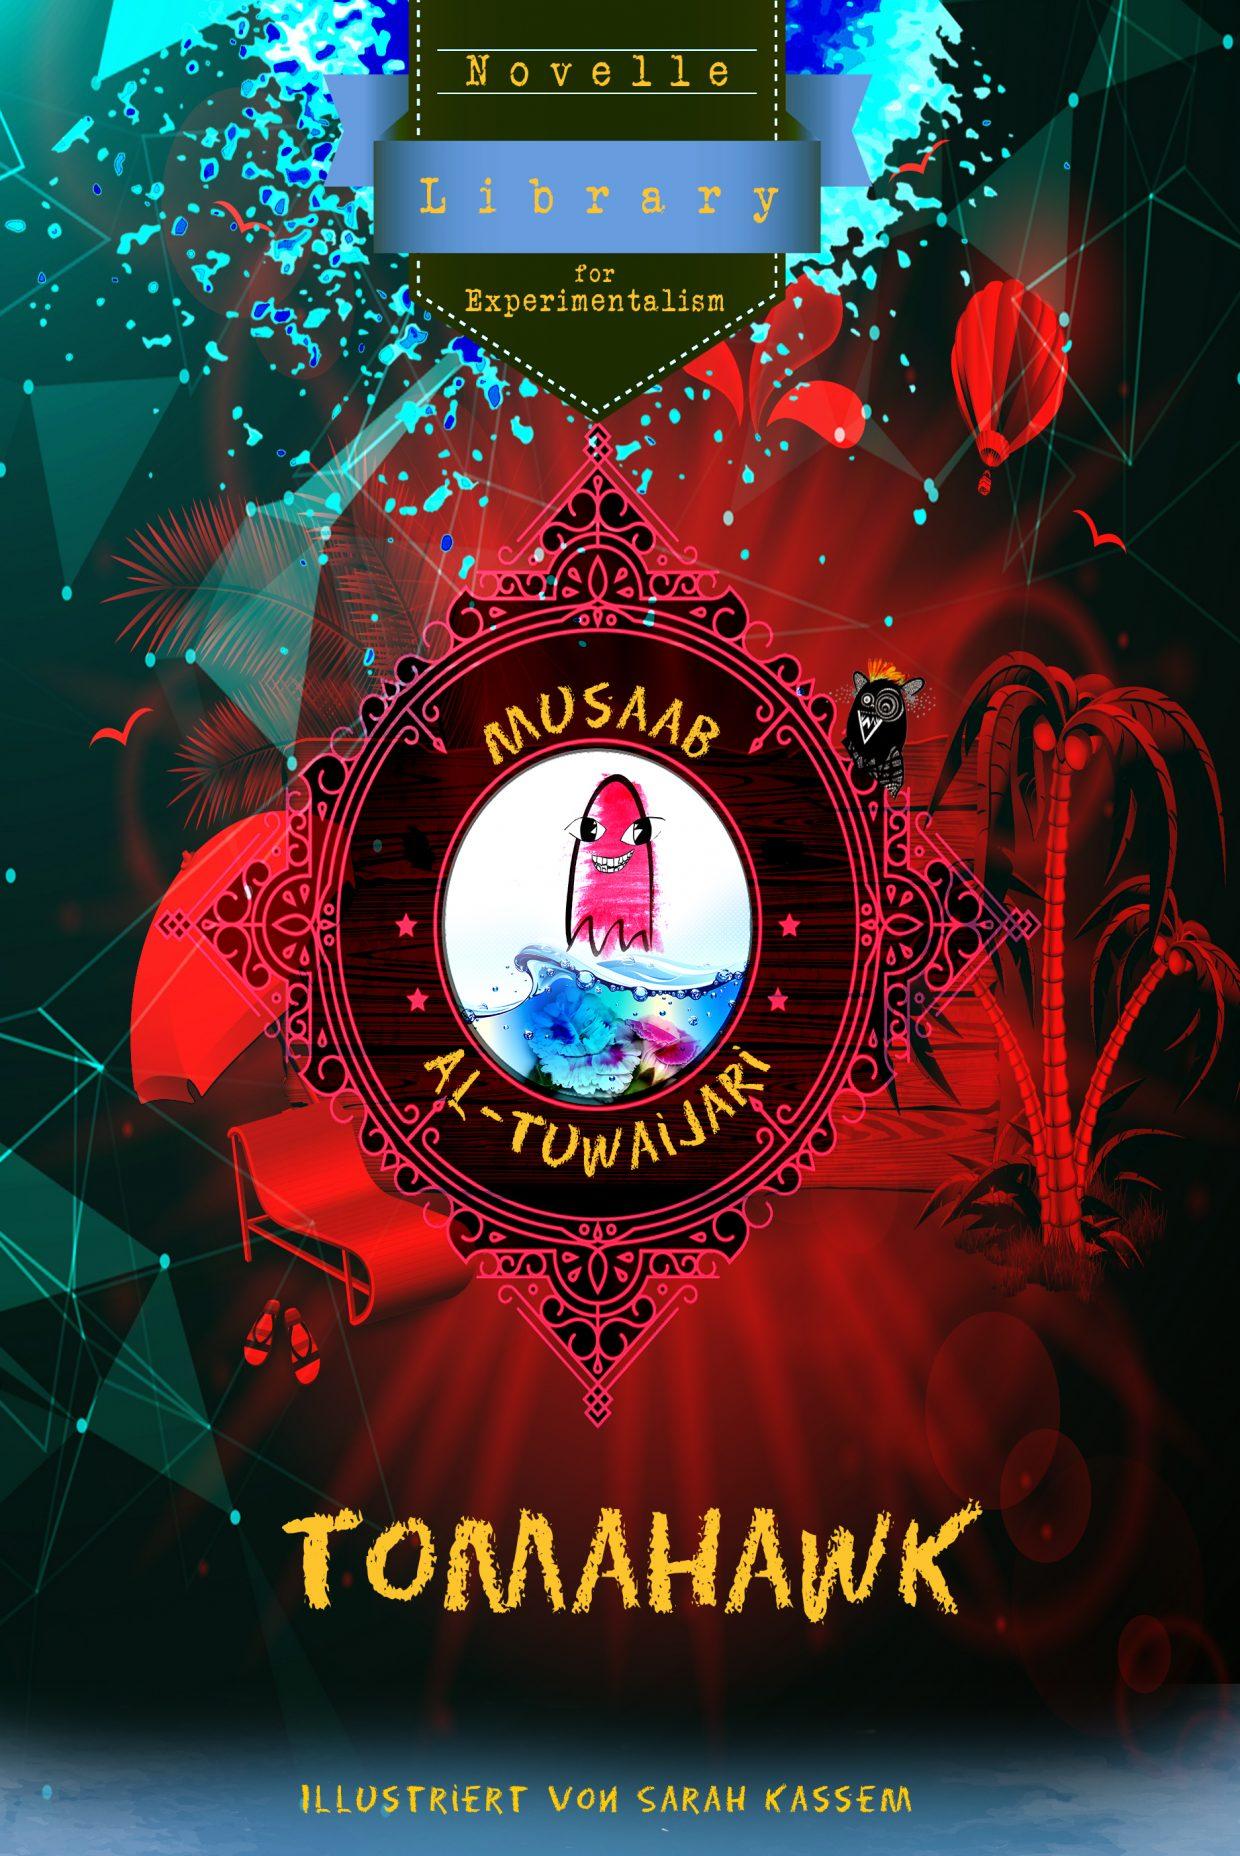 musaab tomahawk